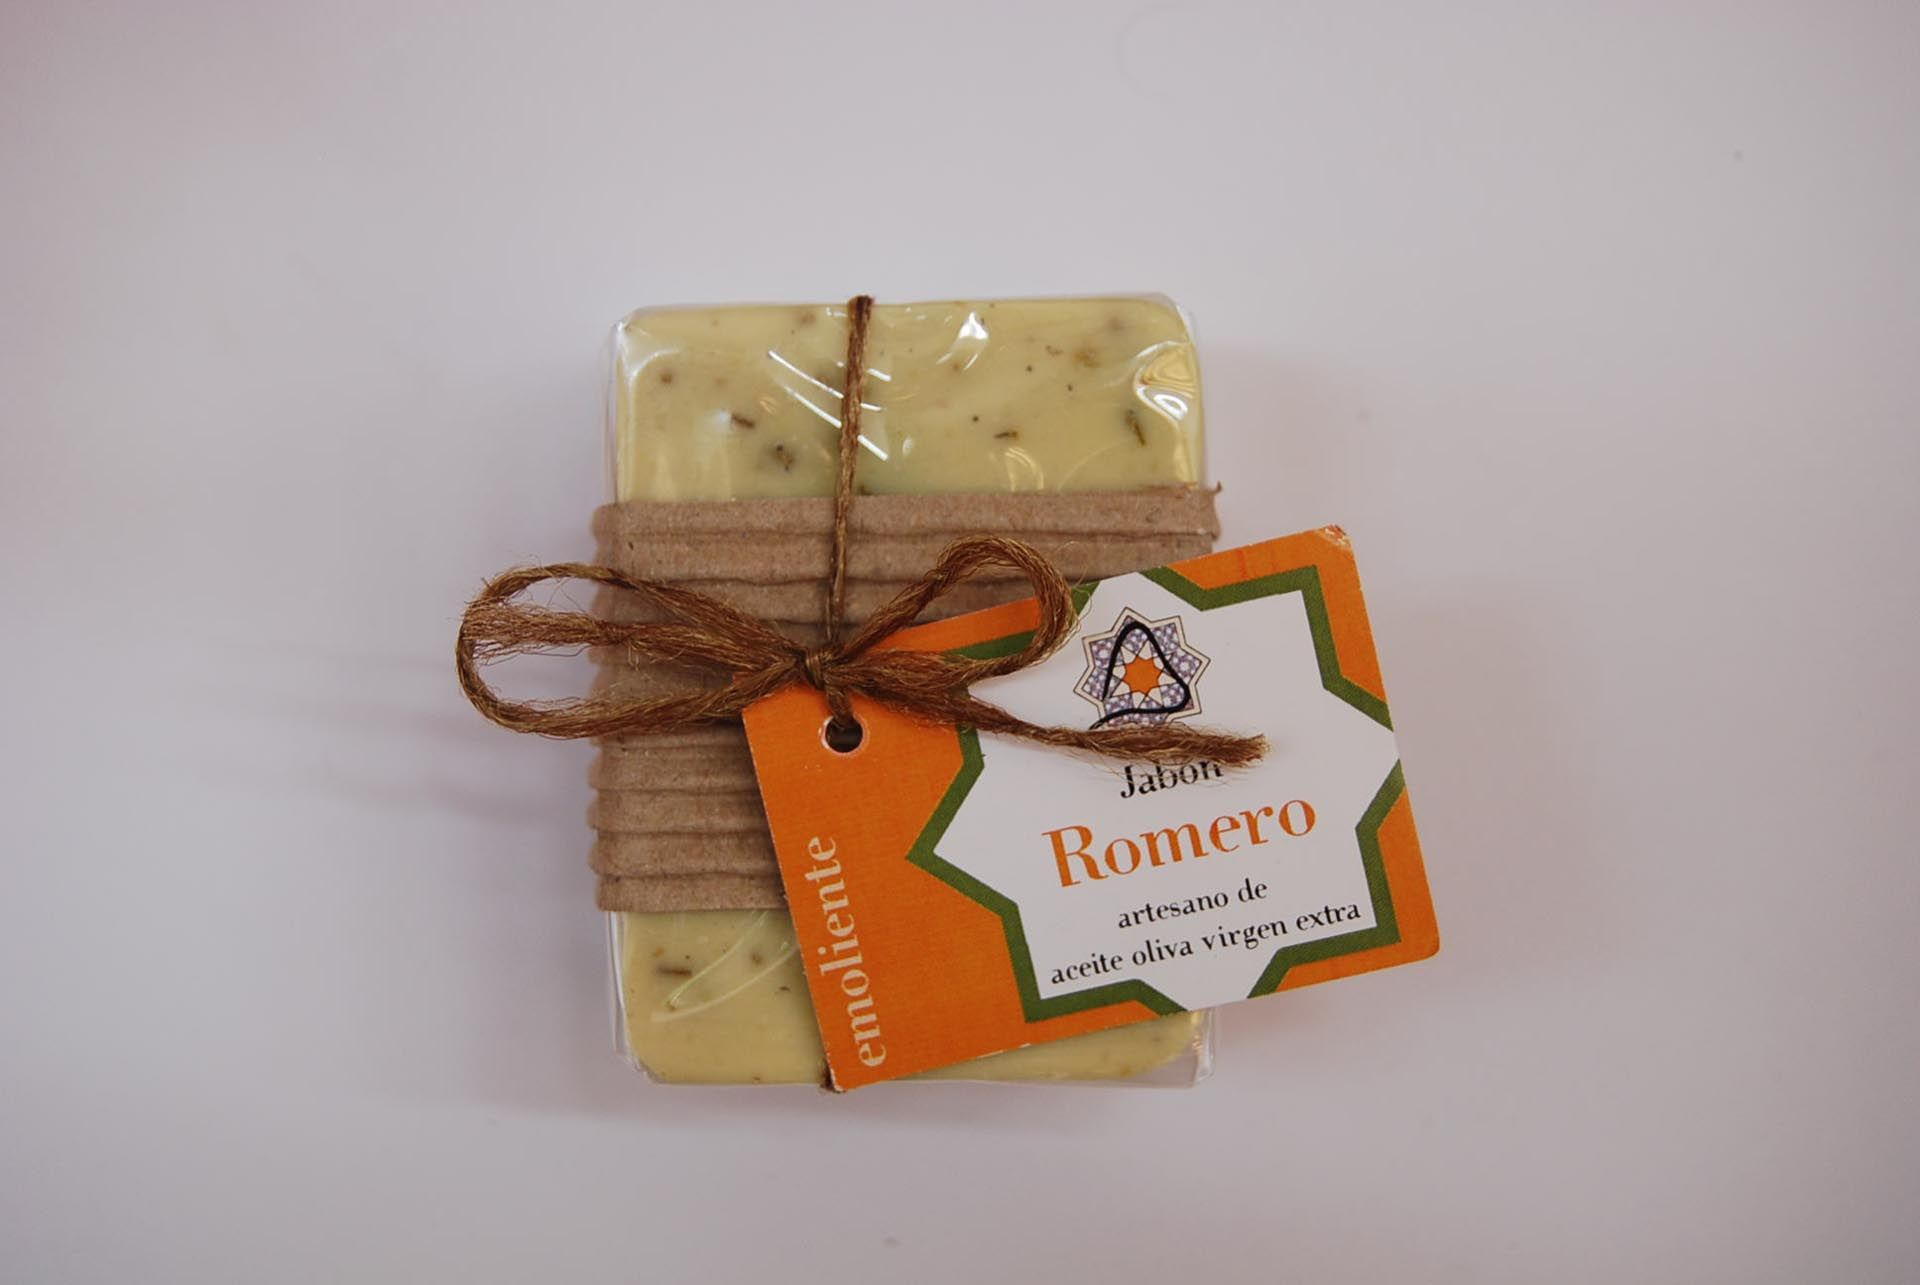 Jabón artesano de romero: Productos de Arahí